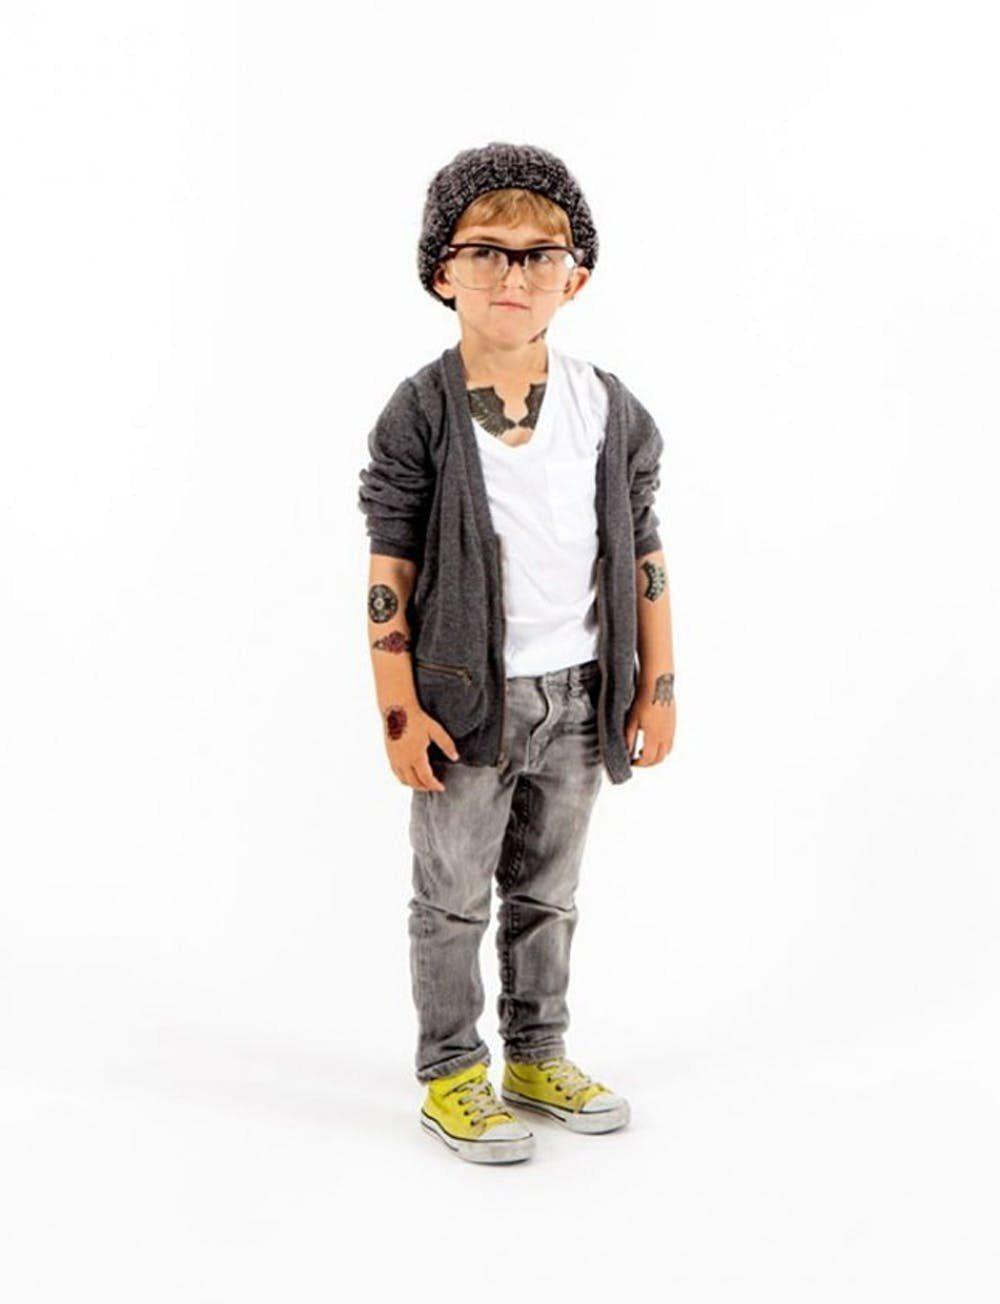 39 Last-Minute DIY Halloween Costume Ideas for Kids ...